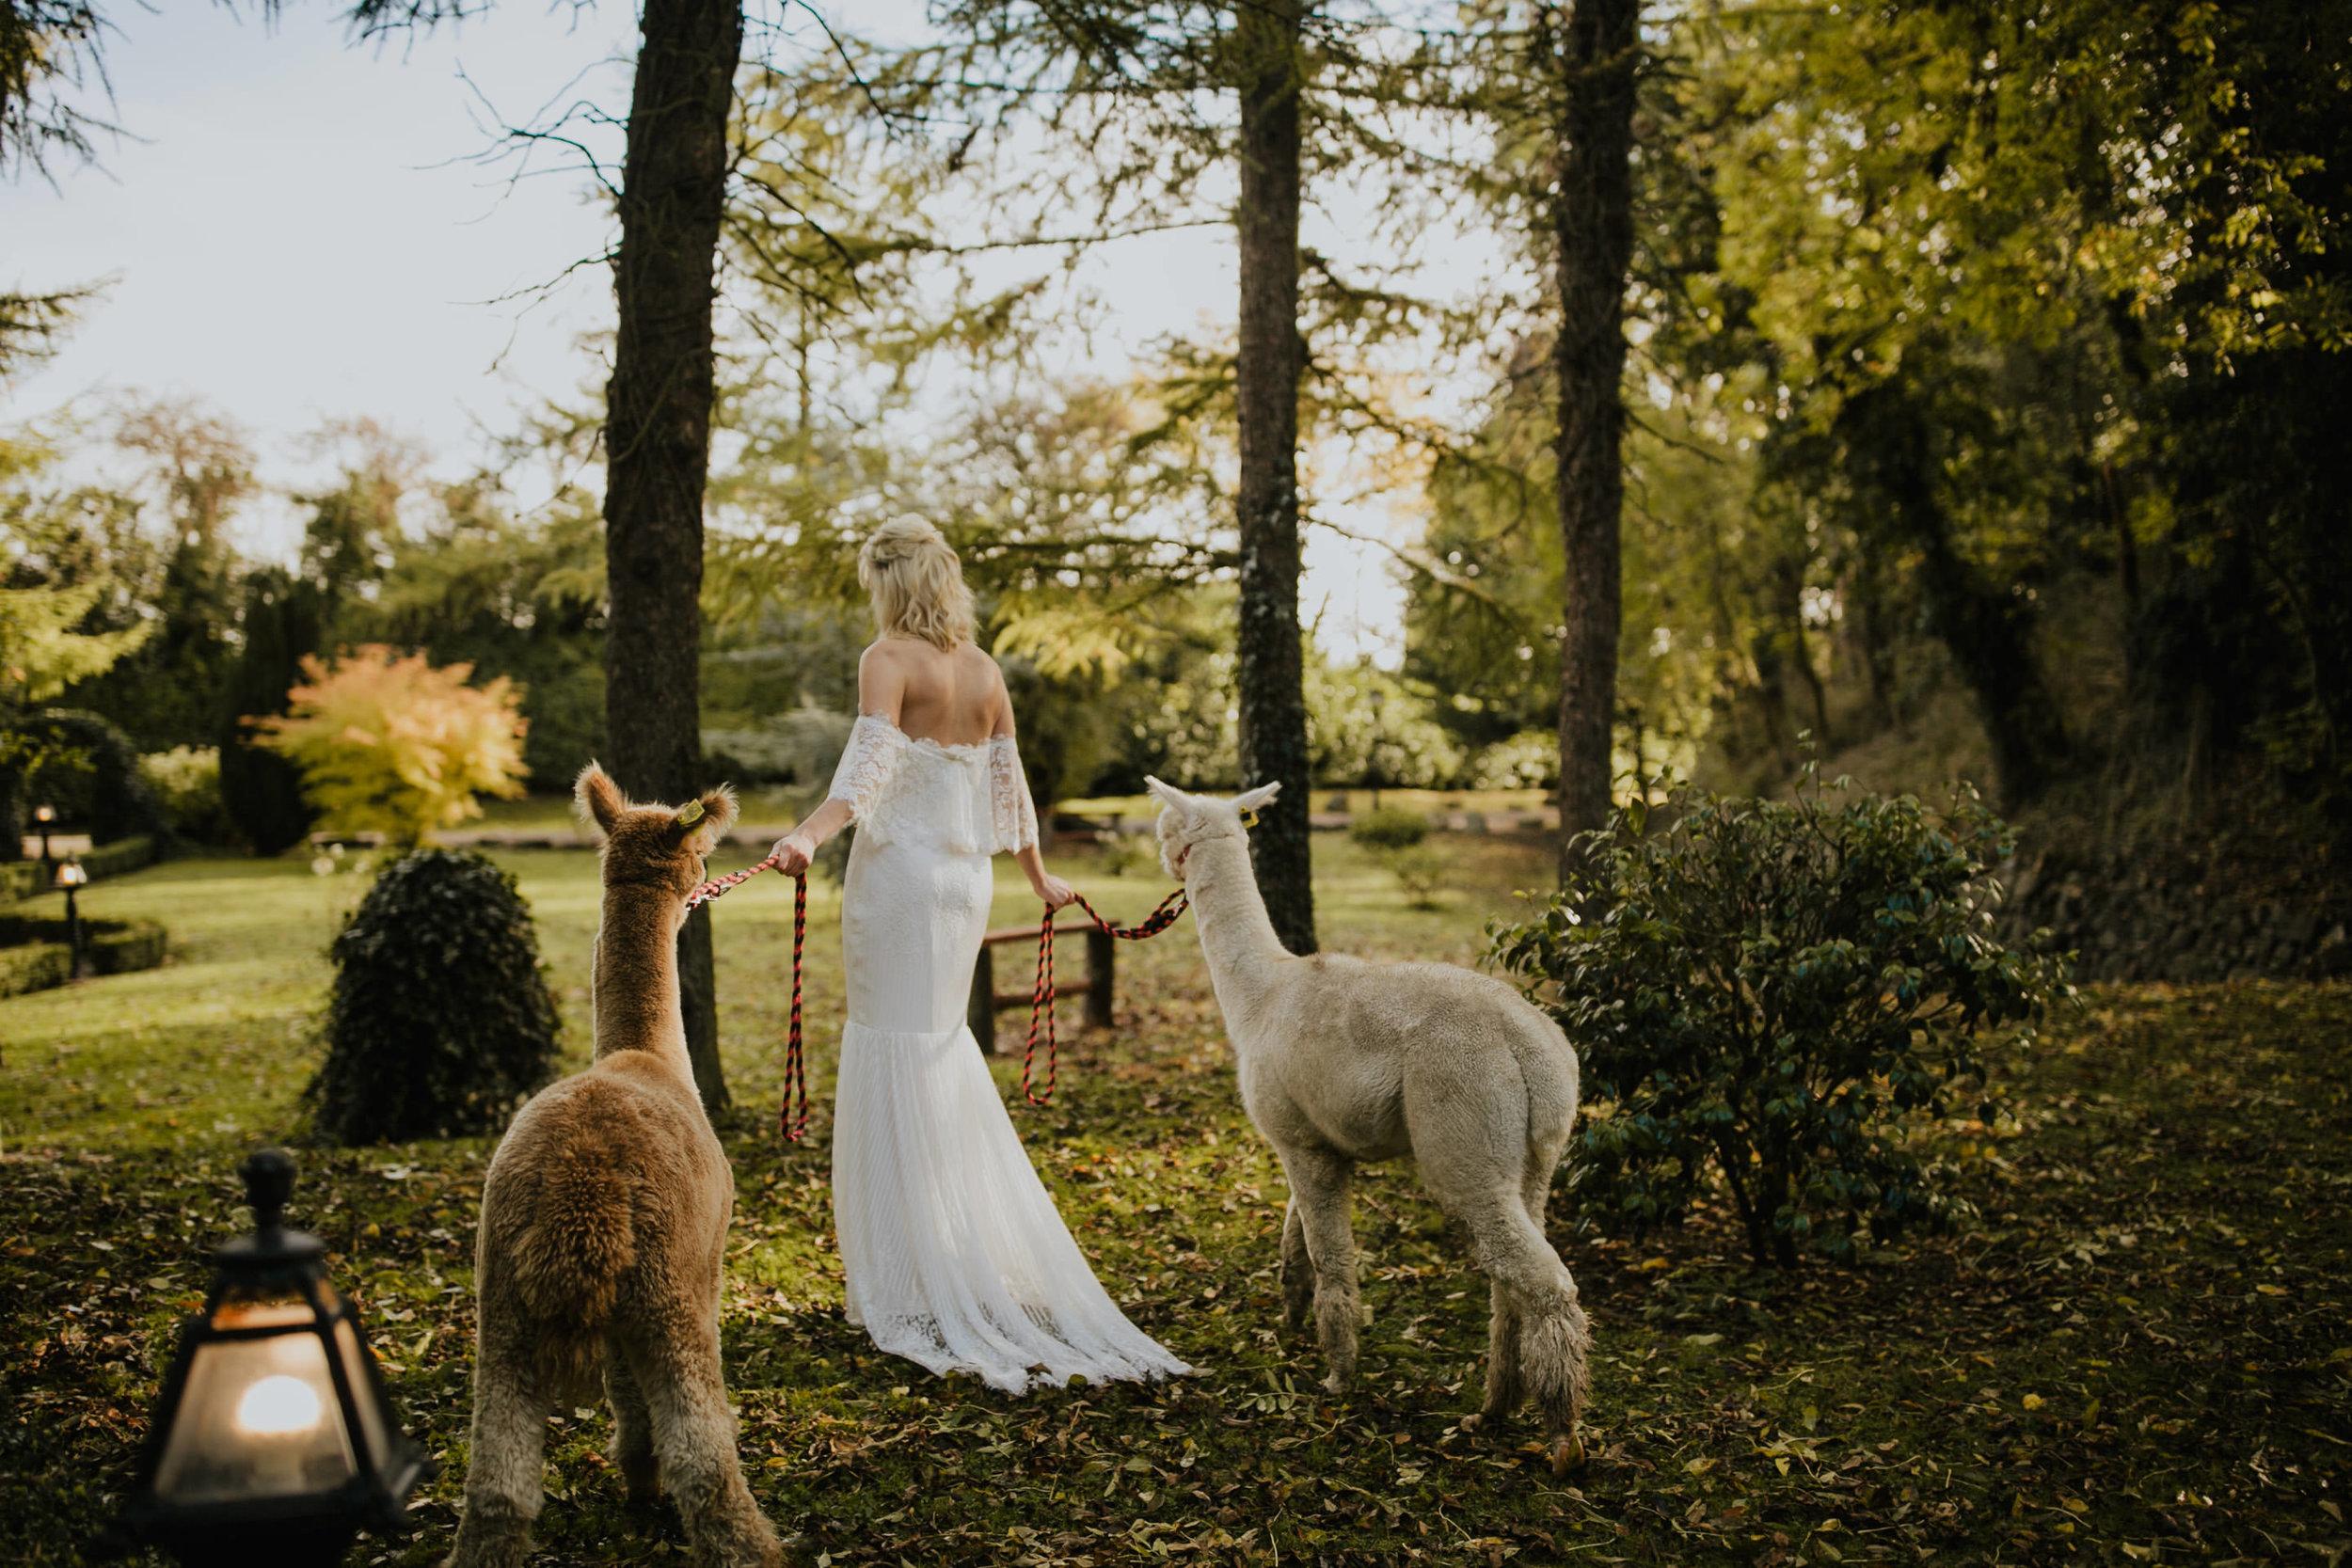 boho_wedding_alpaca_xpose_station_house_livia_figueiredo_photography_08.jpg